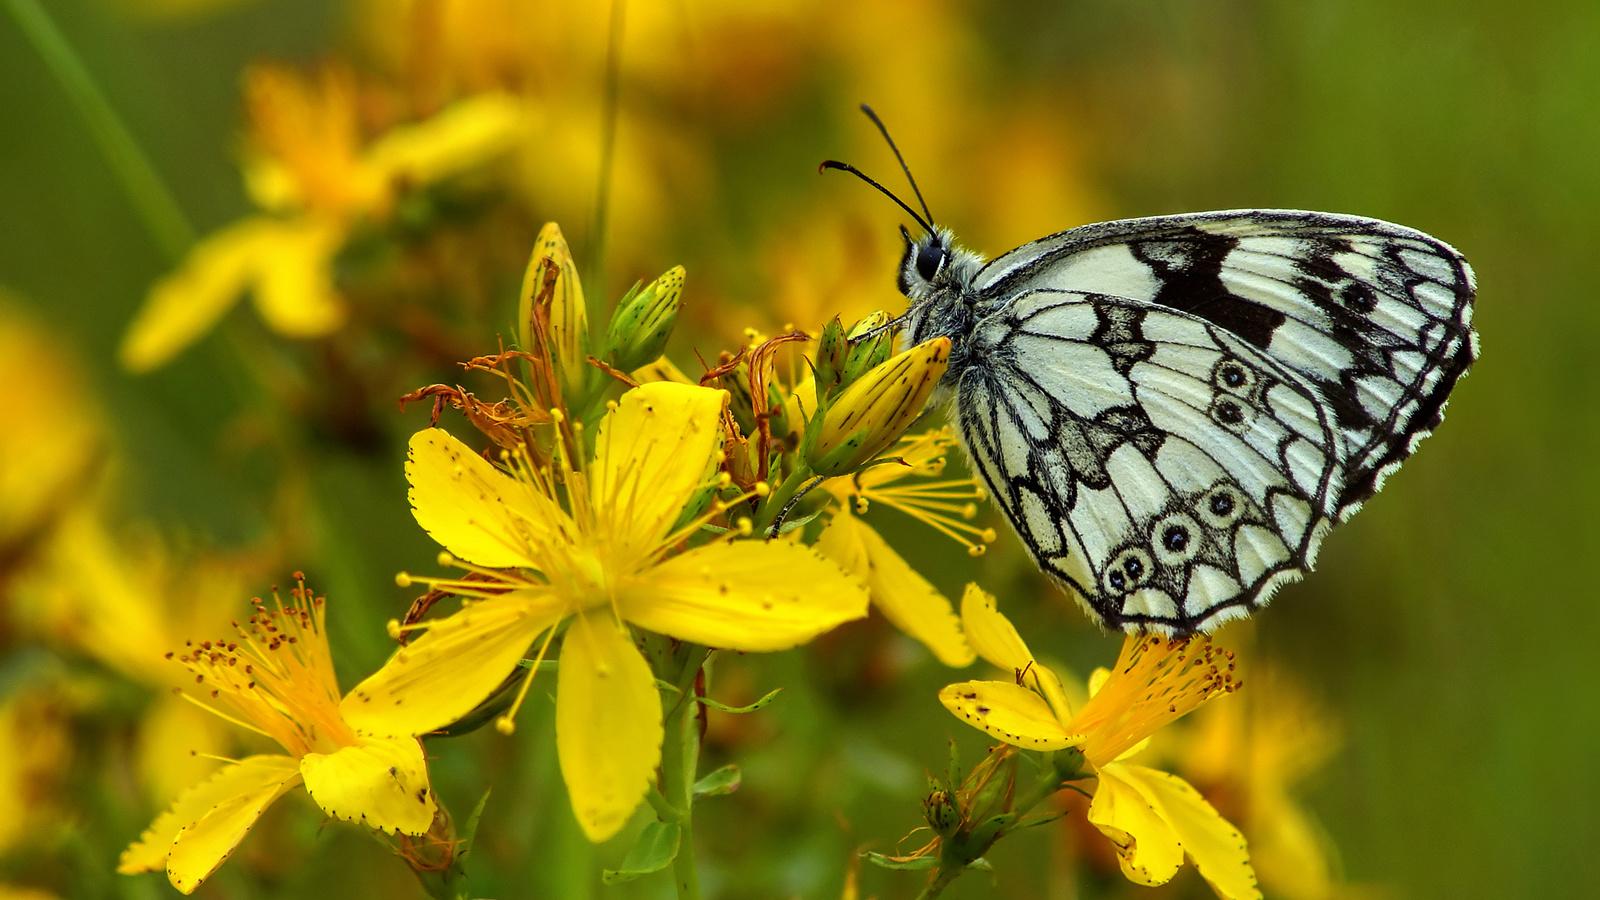 бабочка, butterfly, метелик, квітка, зверобой, макро